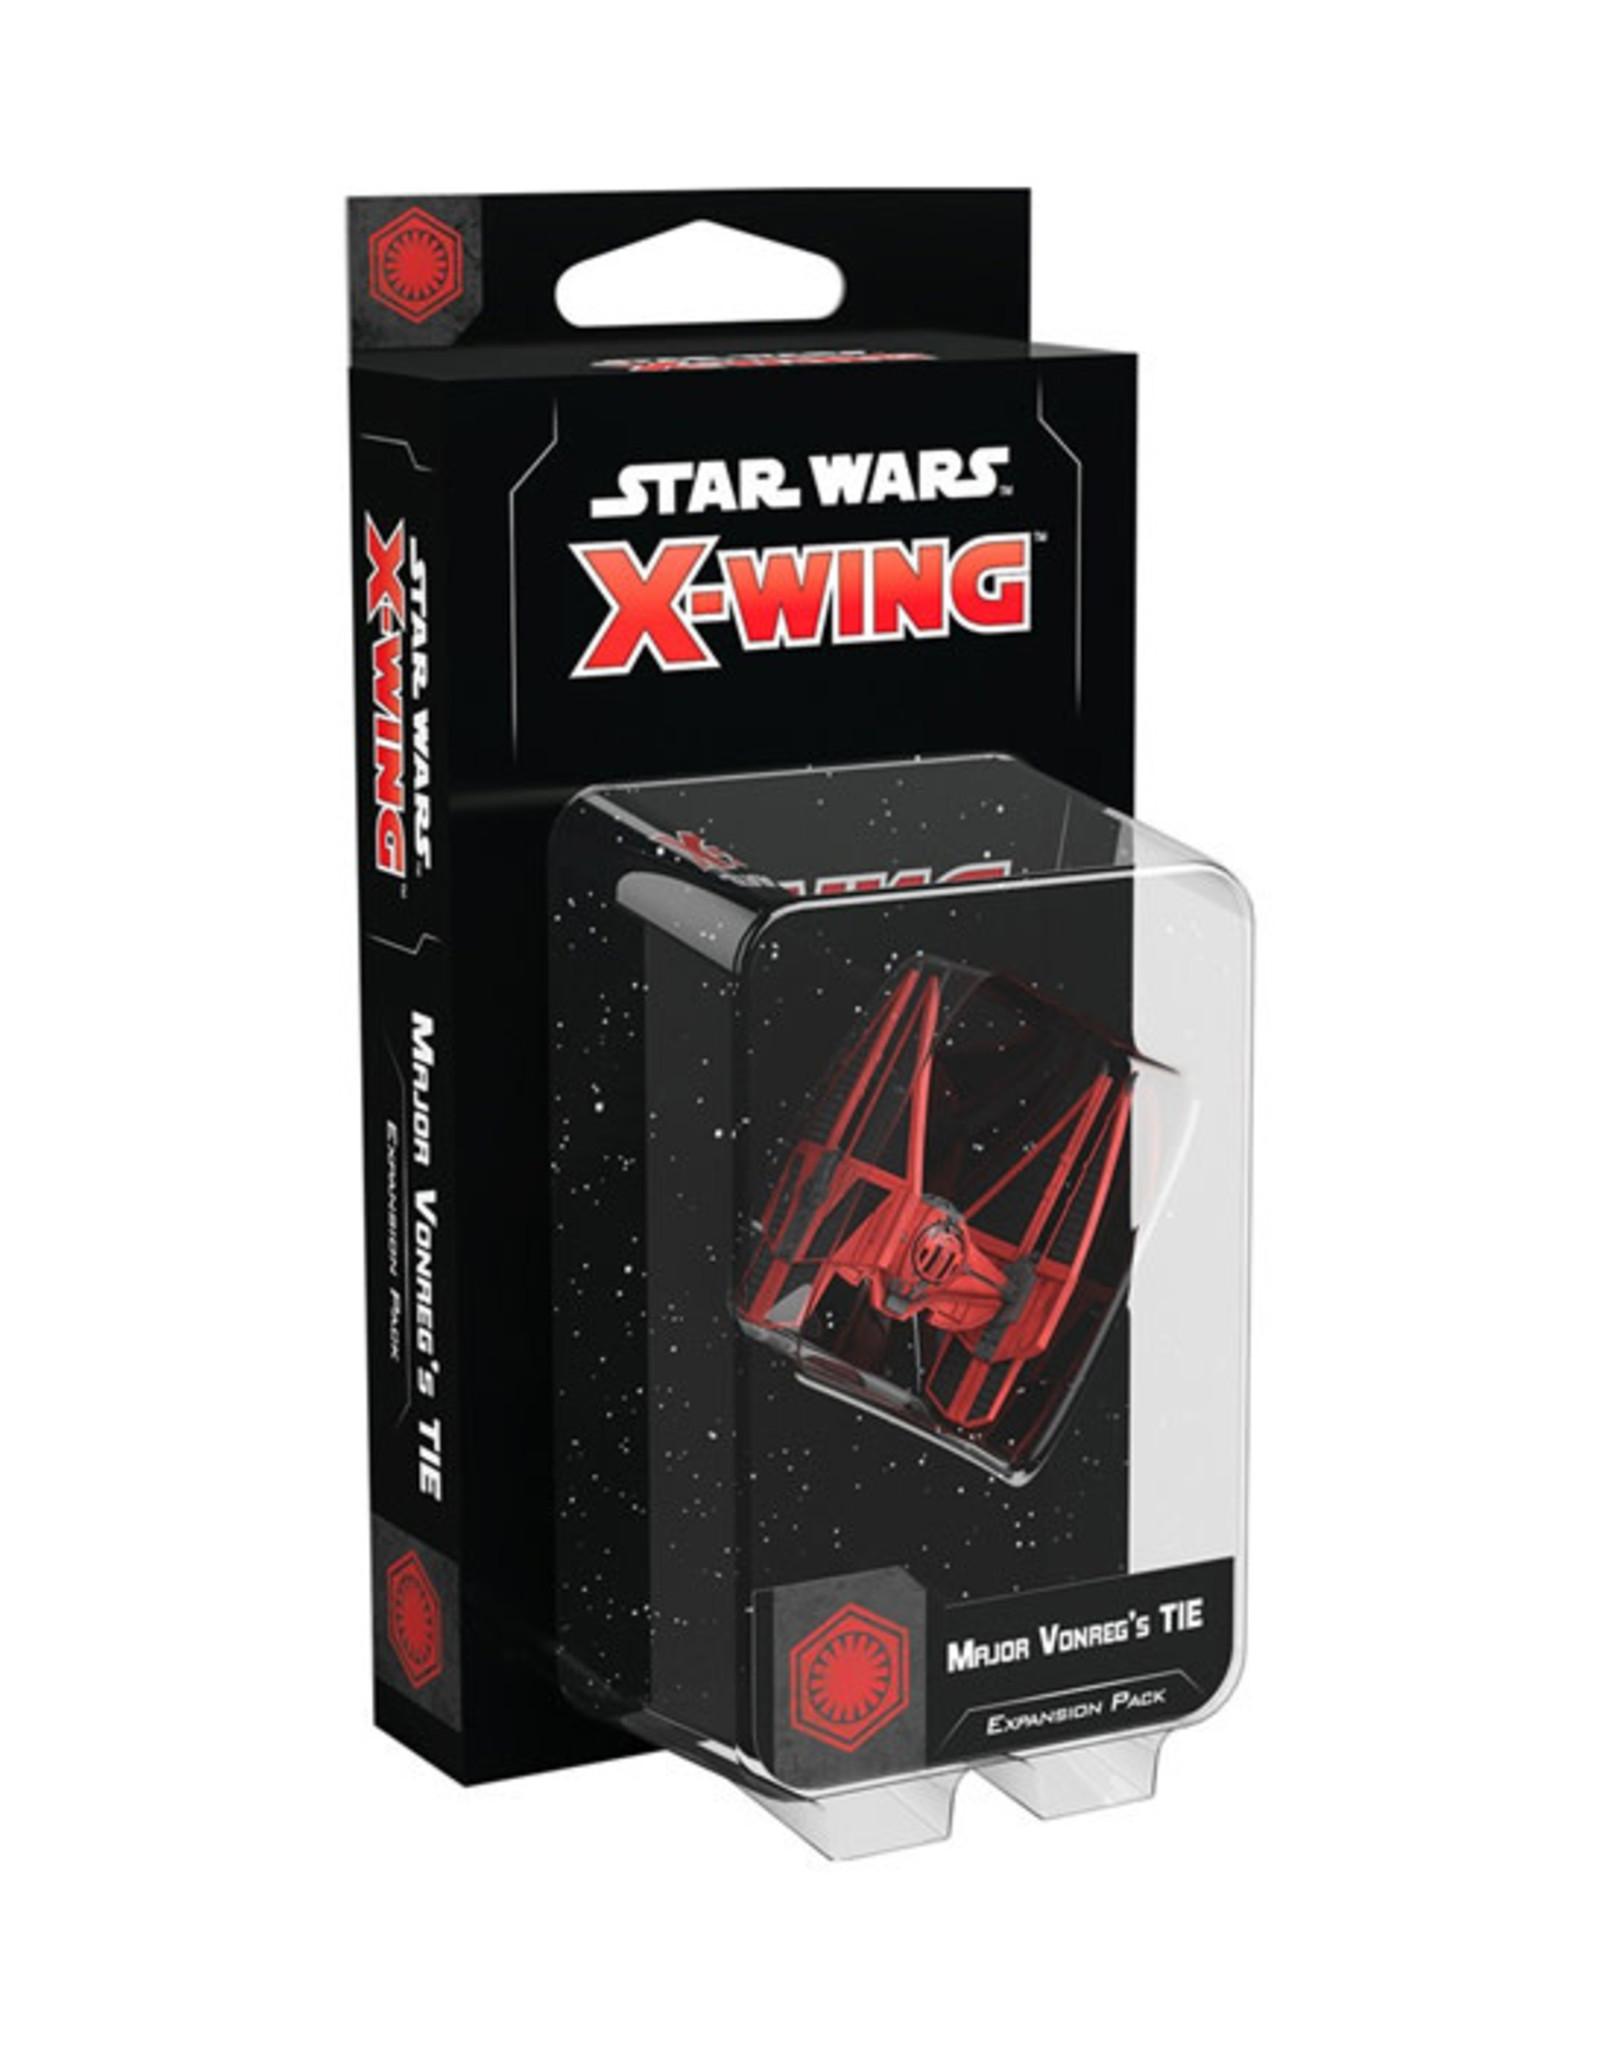 Fantasy Flight Games Star Wars: X-Wing - 2nd Edition - Major Vonreg's TIE